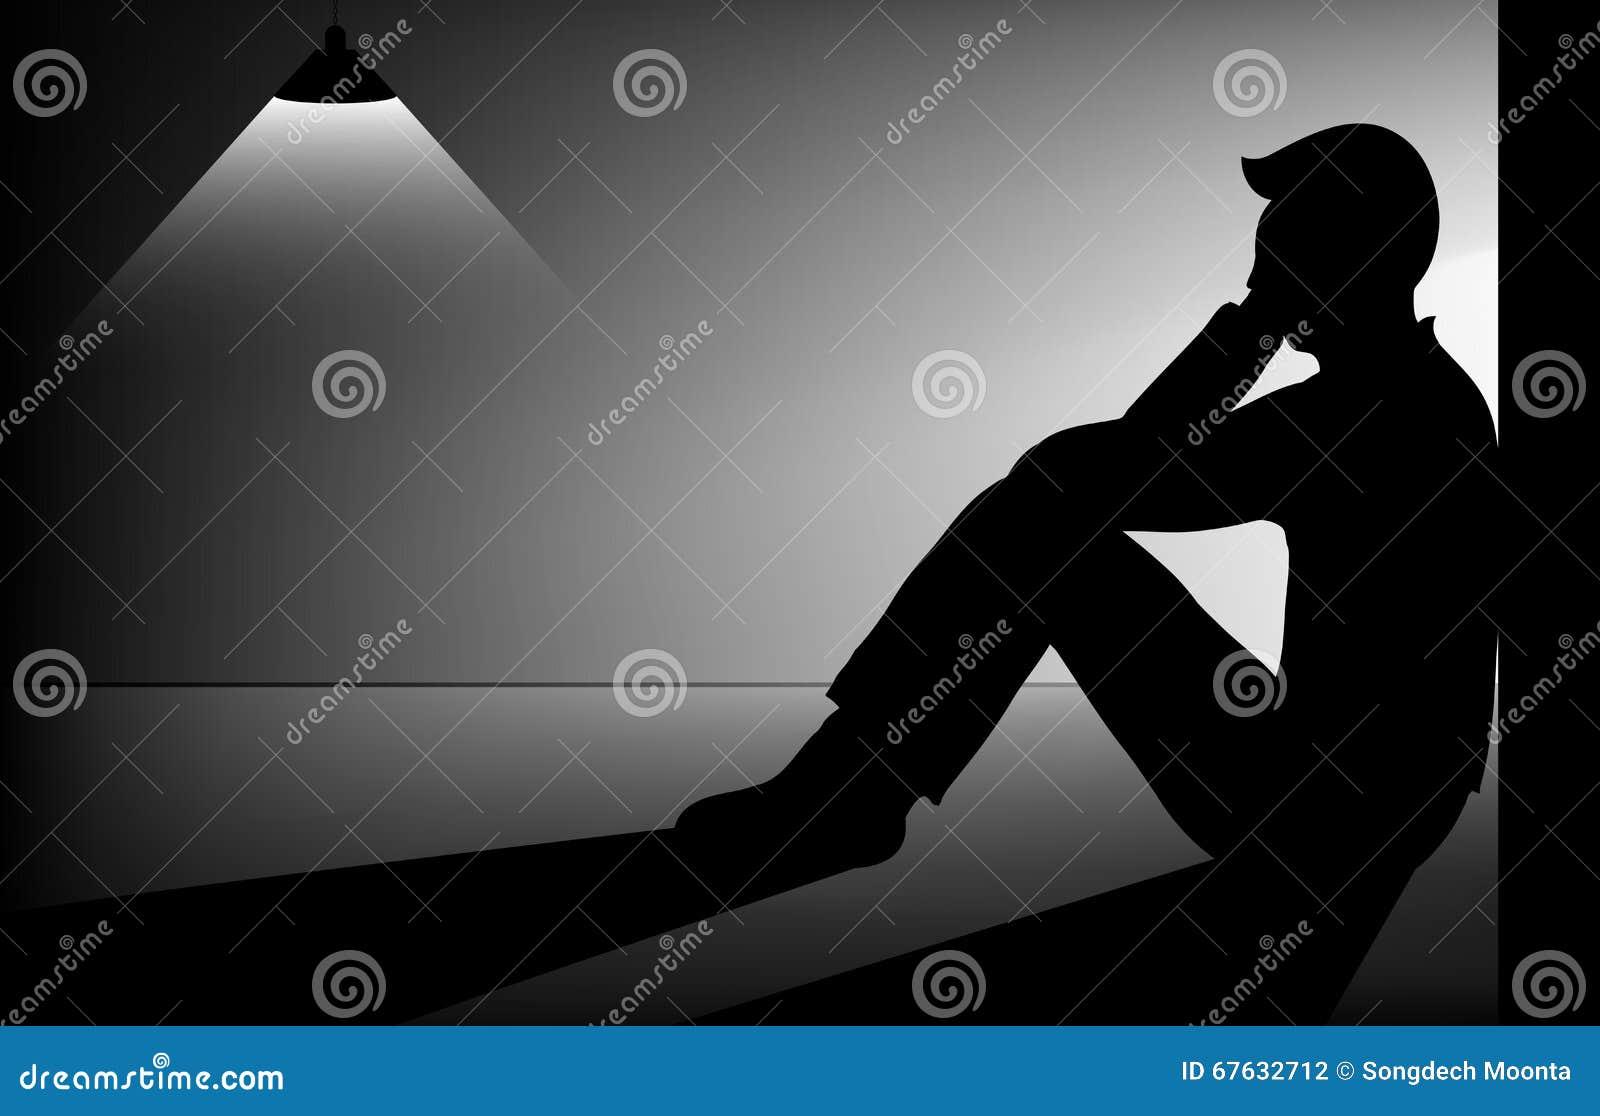 Sad man stock vector. Illustration of hopeless, sorrow ...